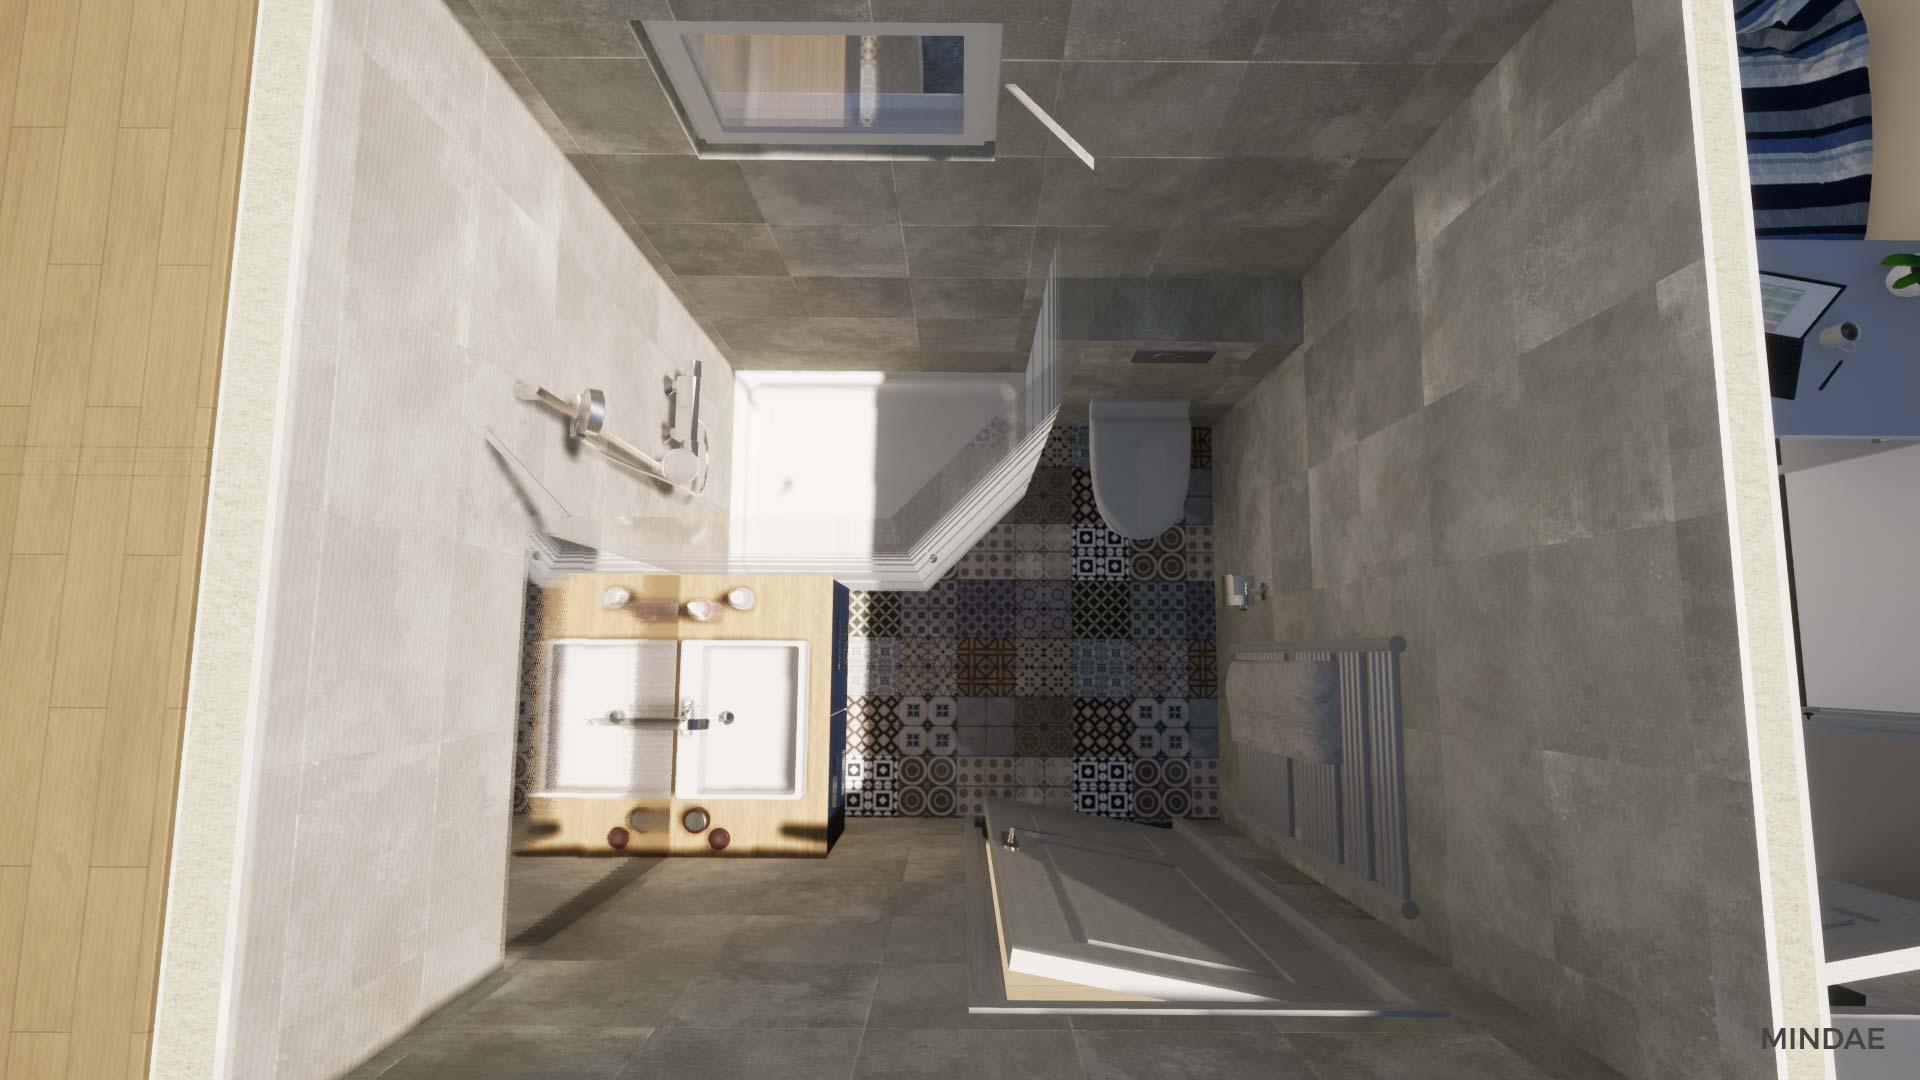 Mindae_3D_appartement_caen_saint_laurent_investisseur_colocation_airbnb_locatif_renovation_F2_F3-(11)